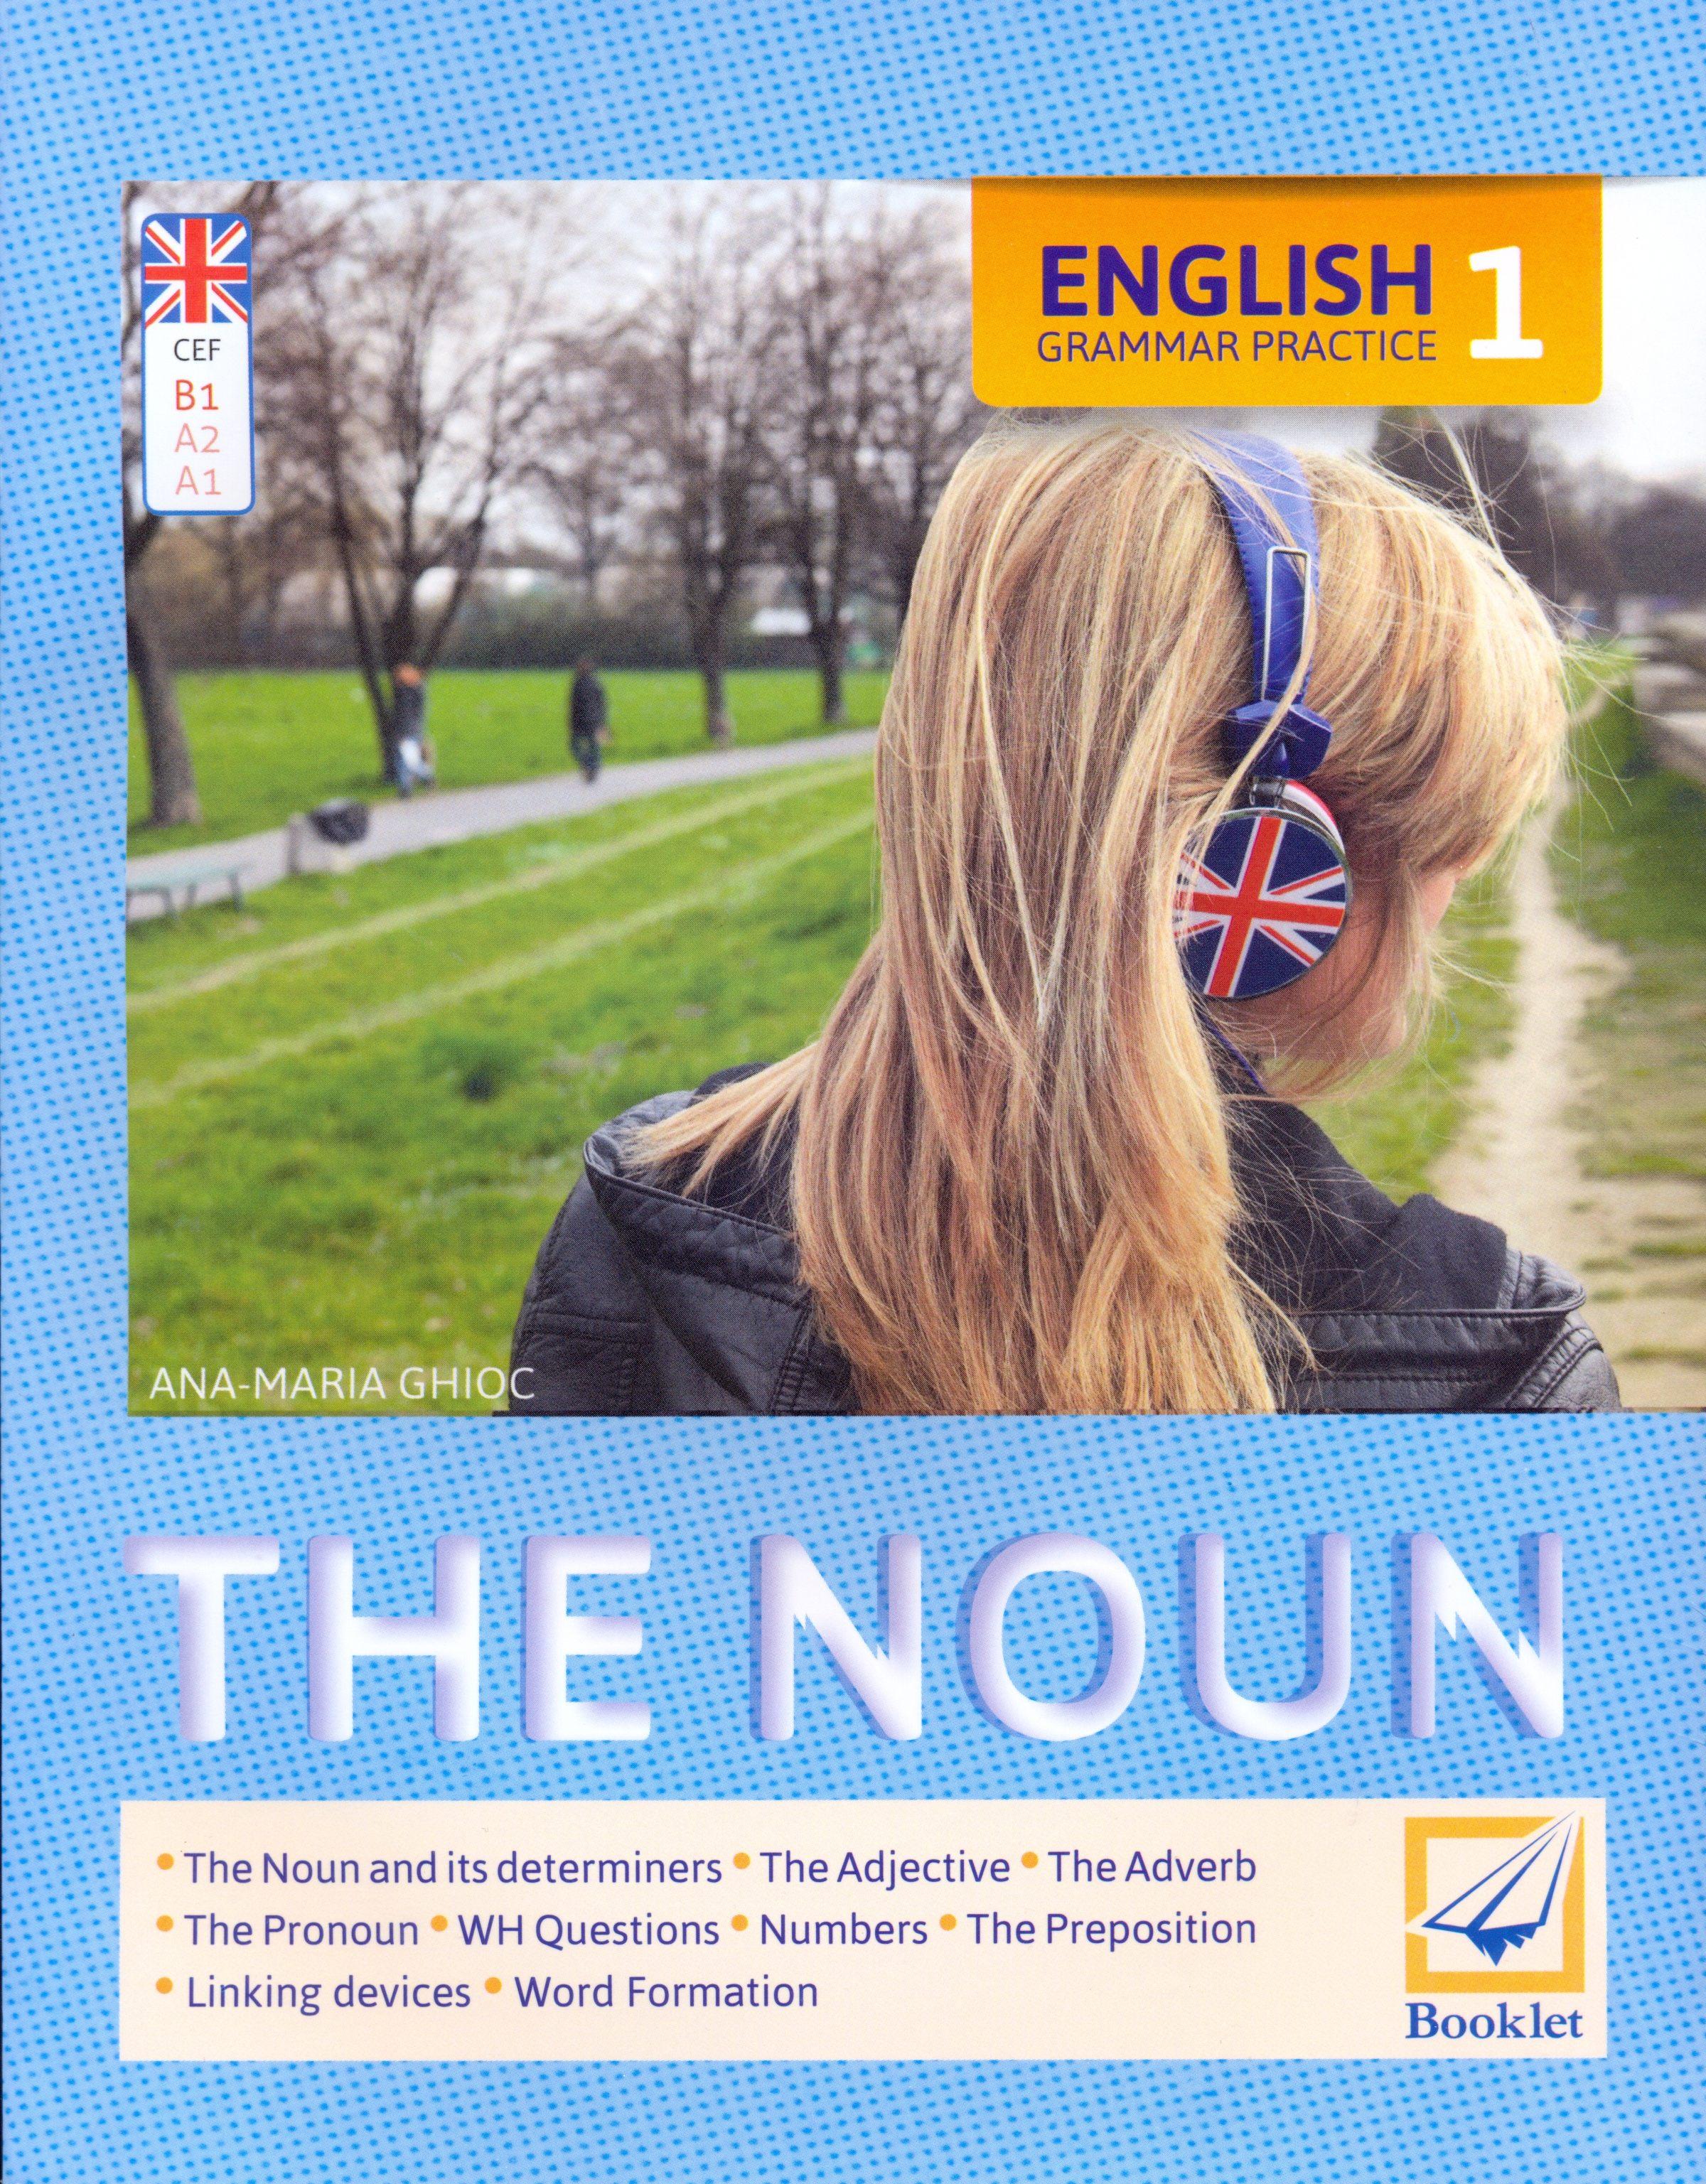 English Grammar Practice 1 - The Noun